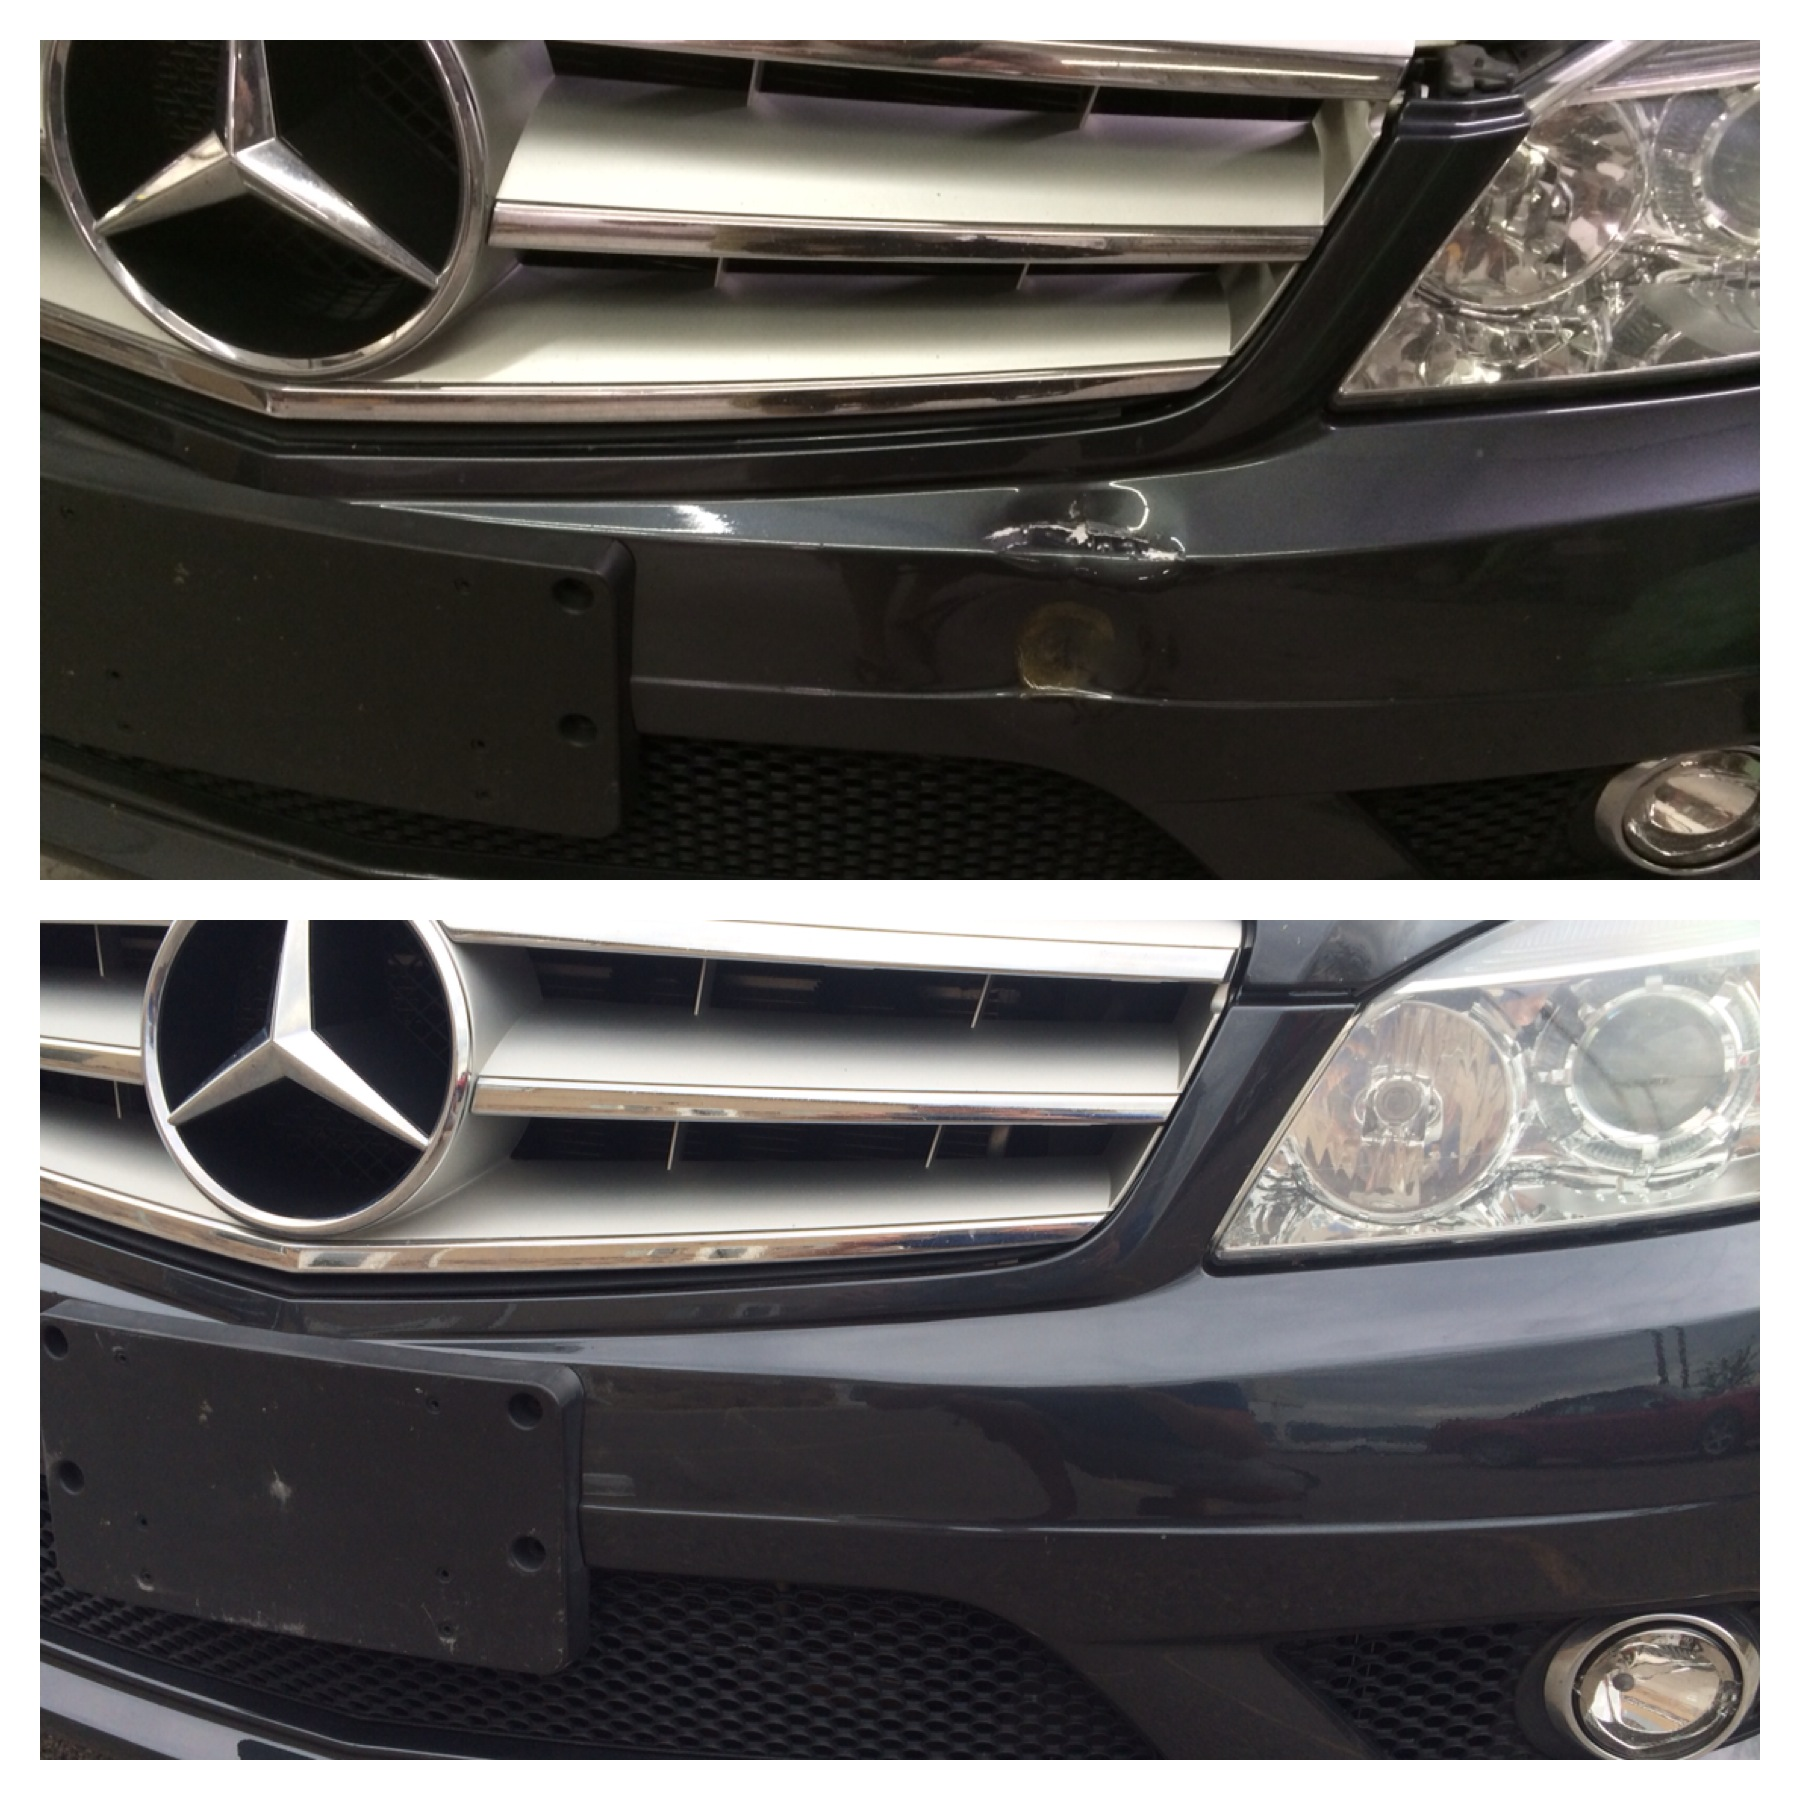 trustworthy auto insurance los angeles ca flexible payment